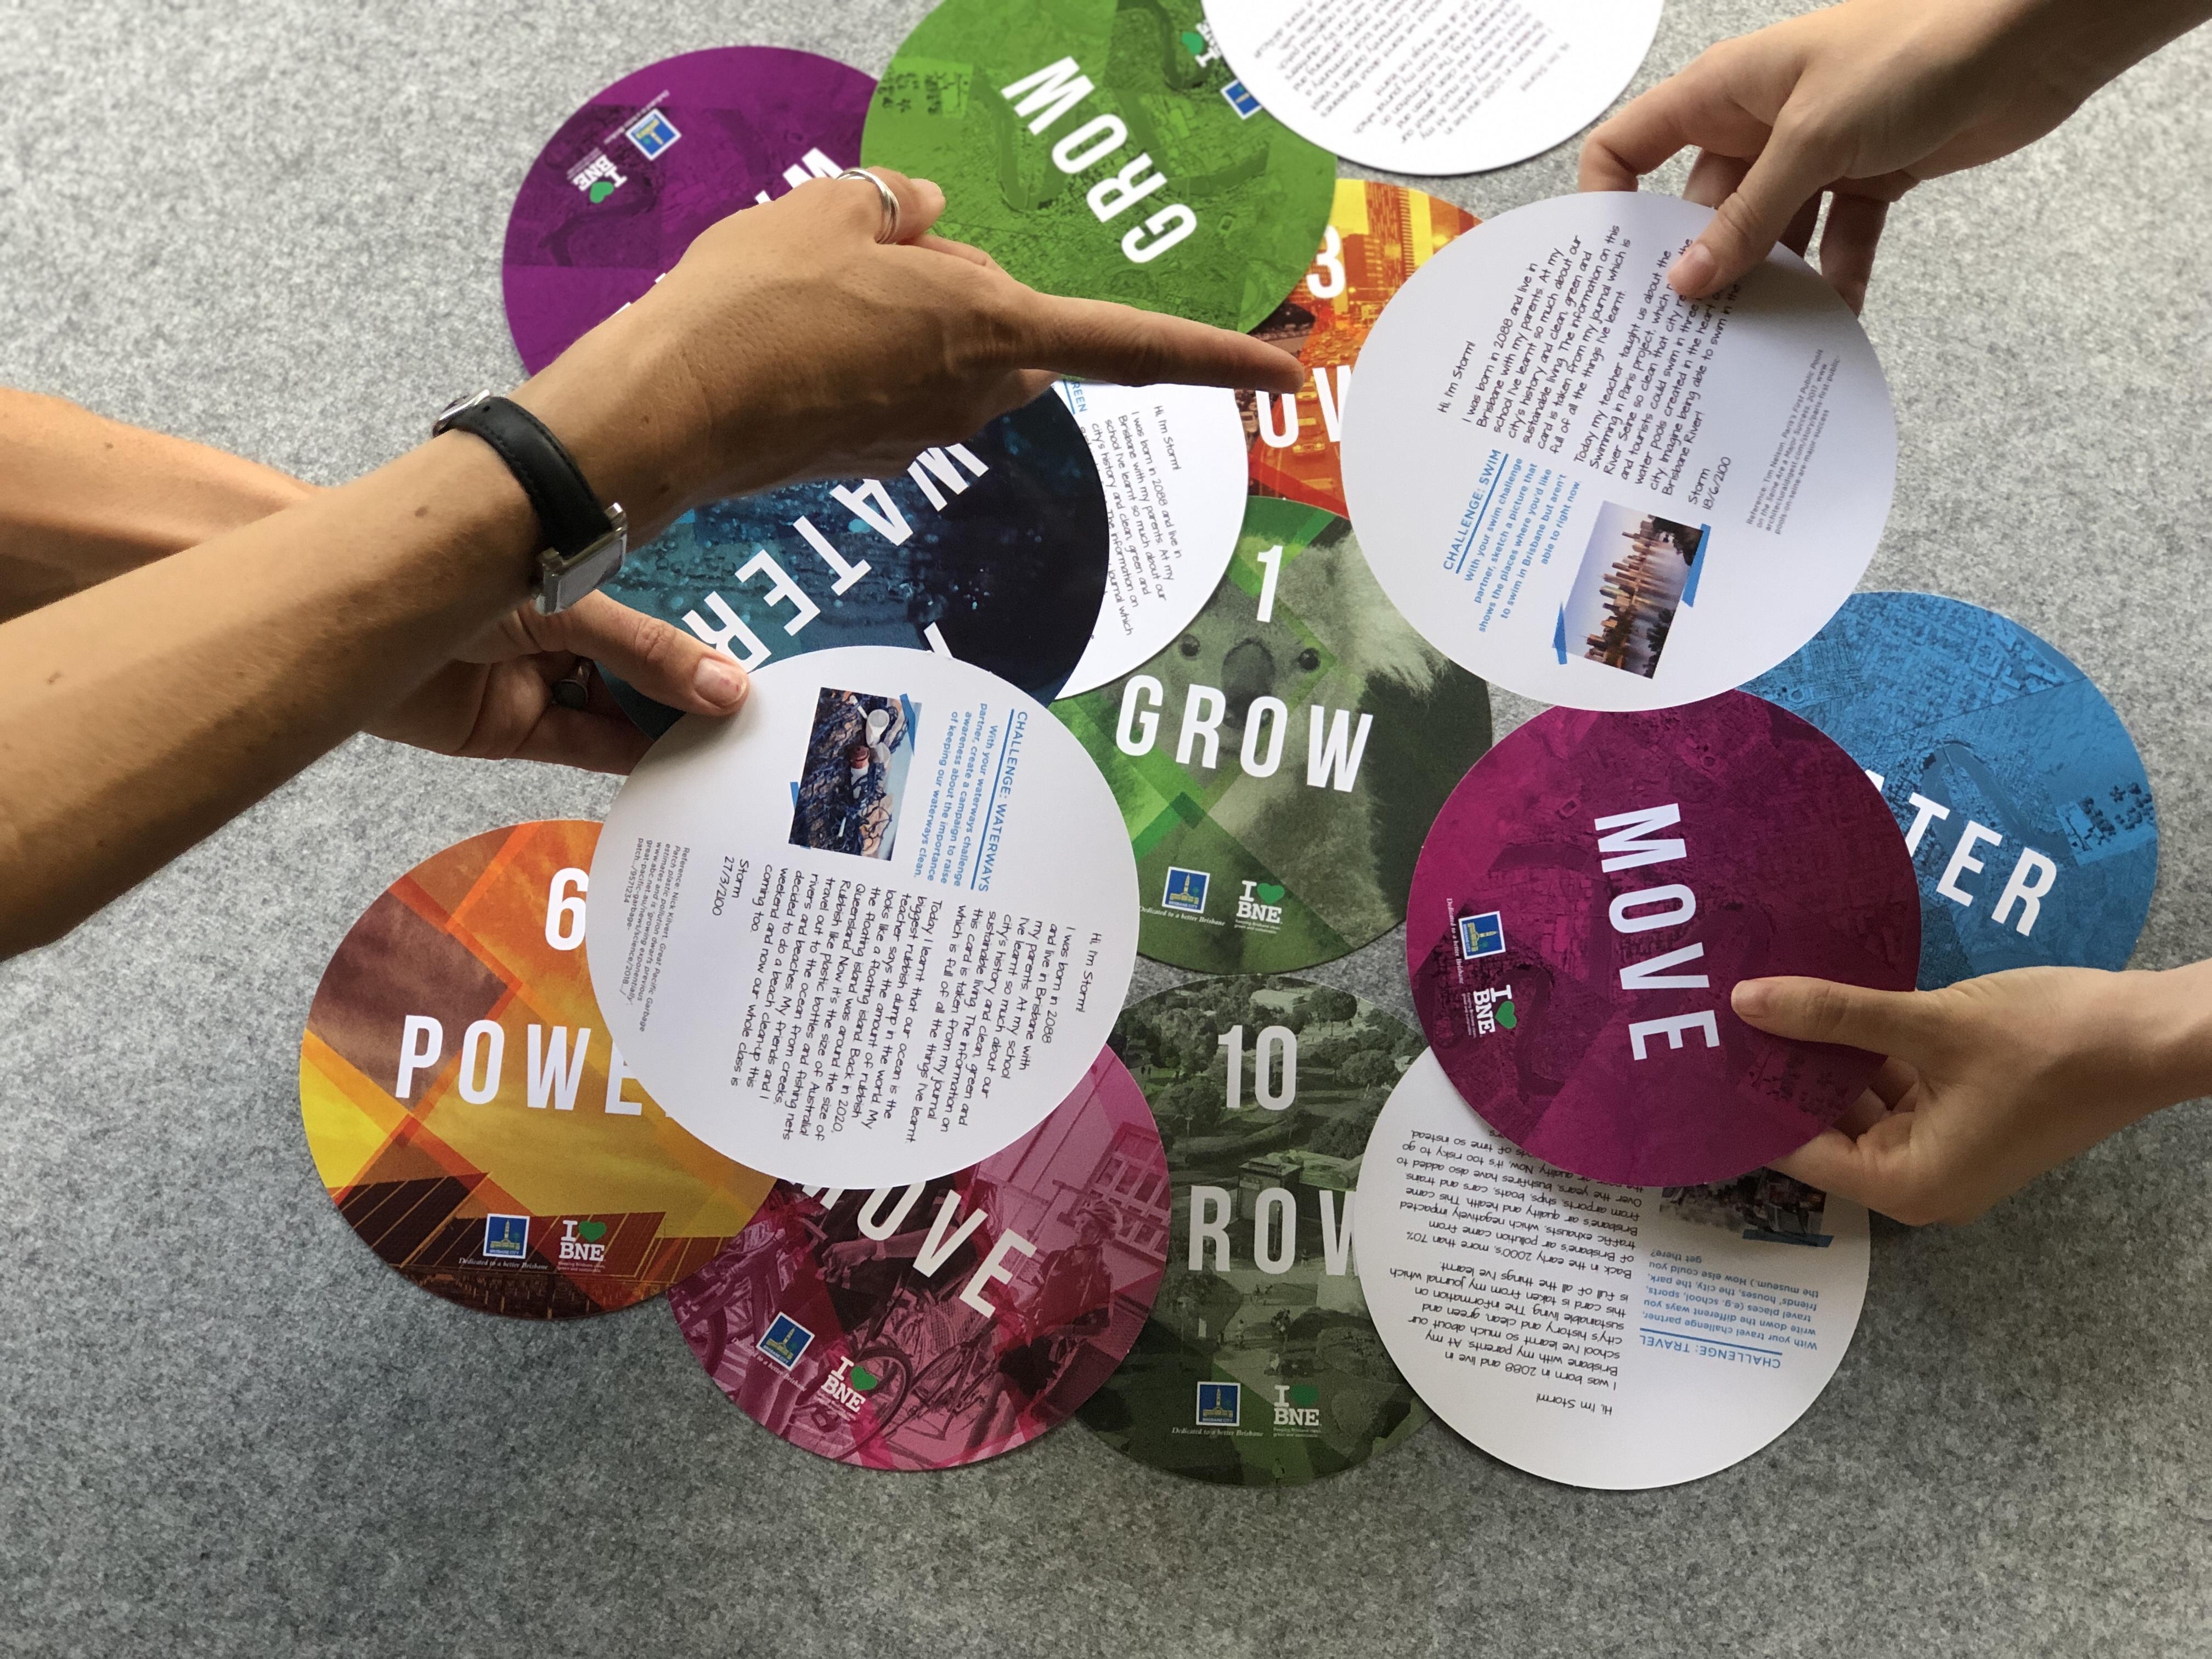 FutureBNE 2020 knowledge cards